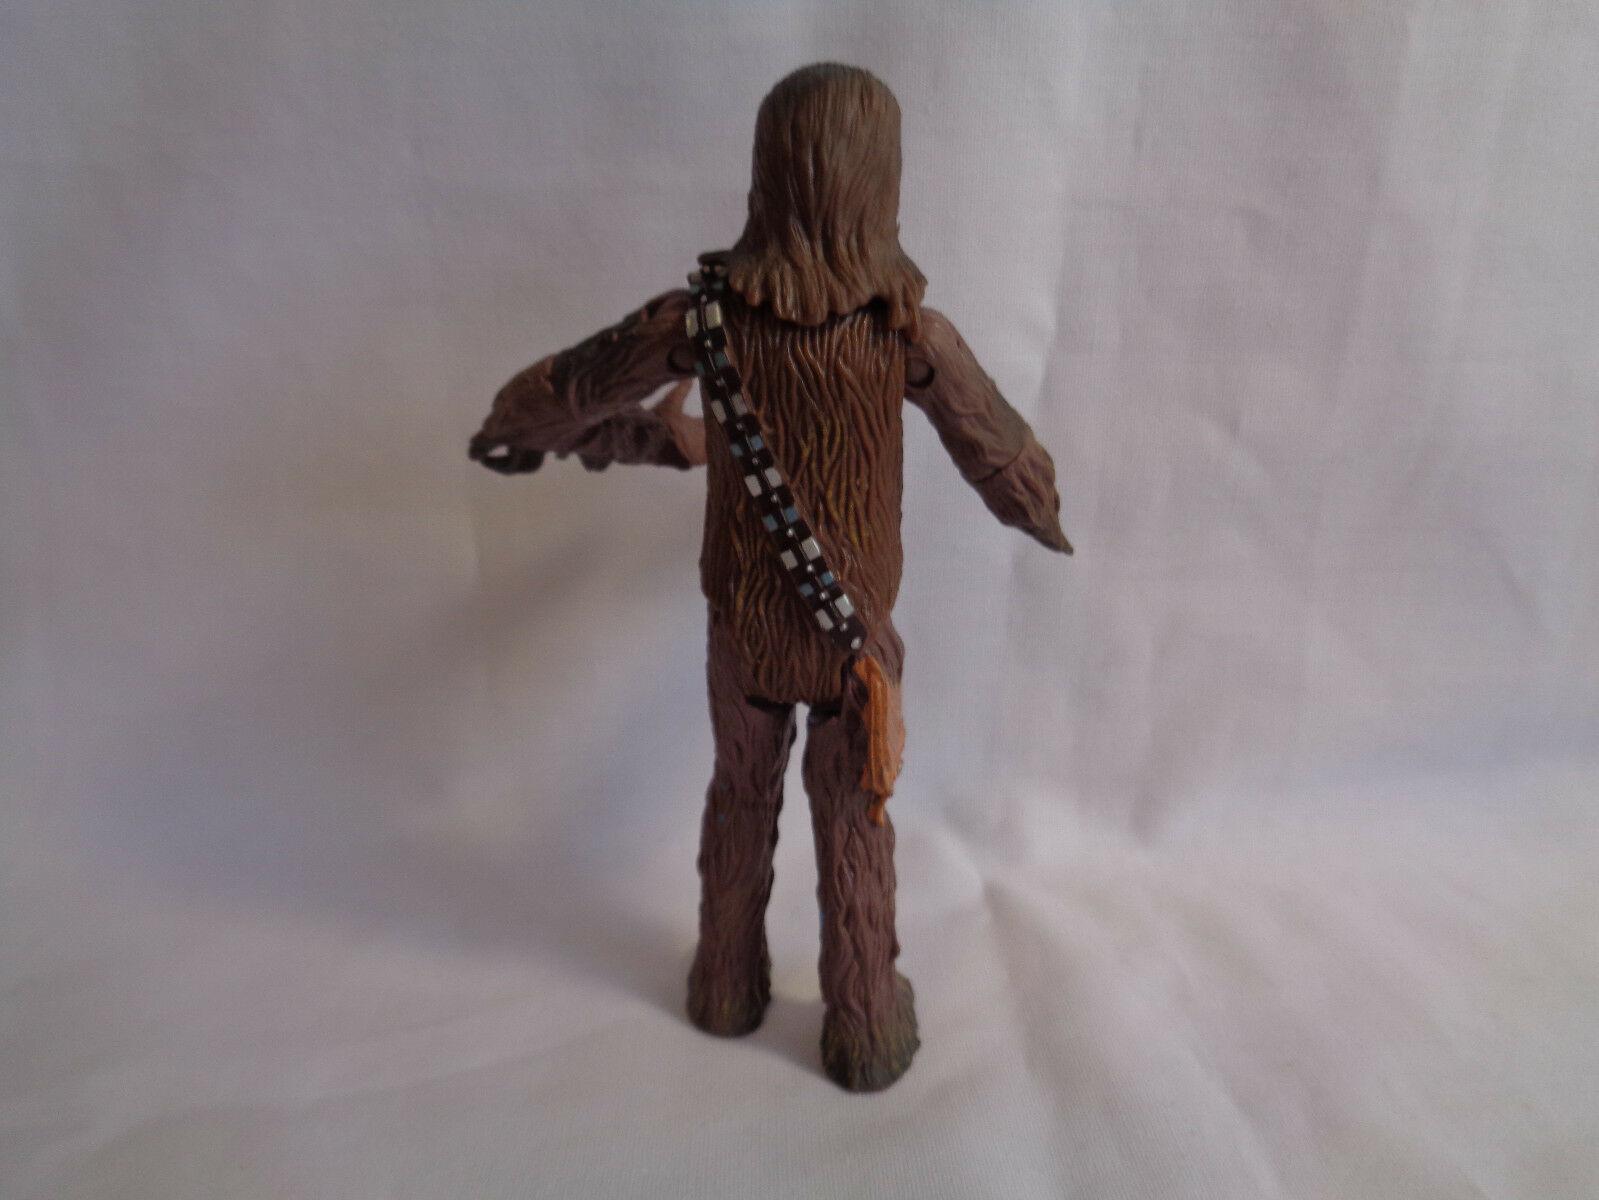 2001 Hasbro Star Wars Chewbacca Action Figure image 5